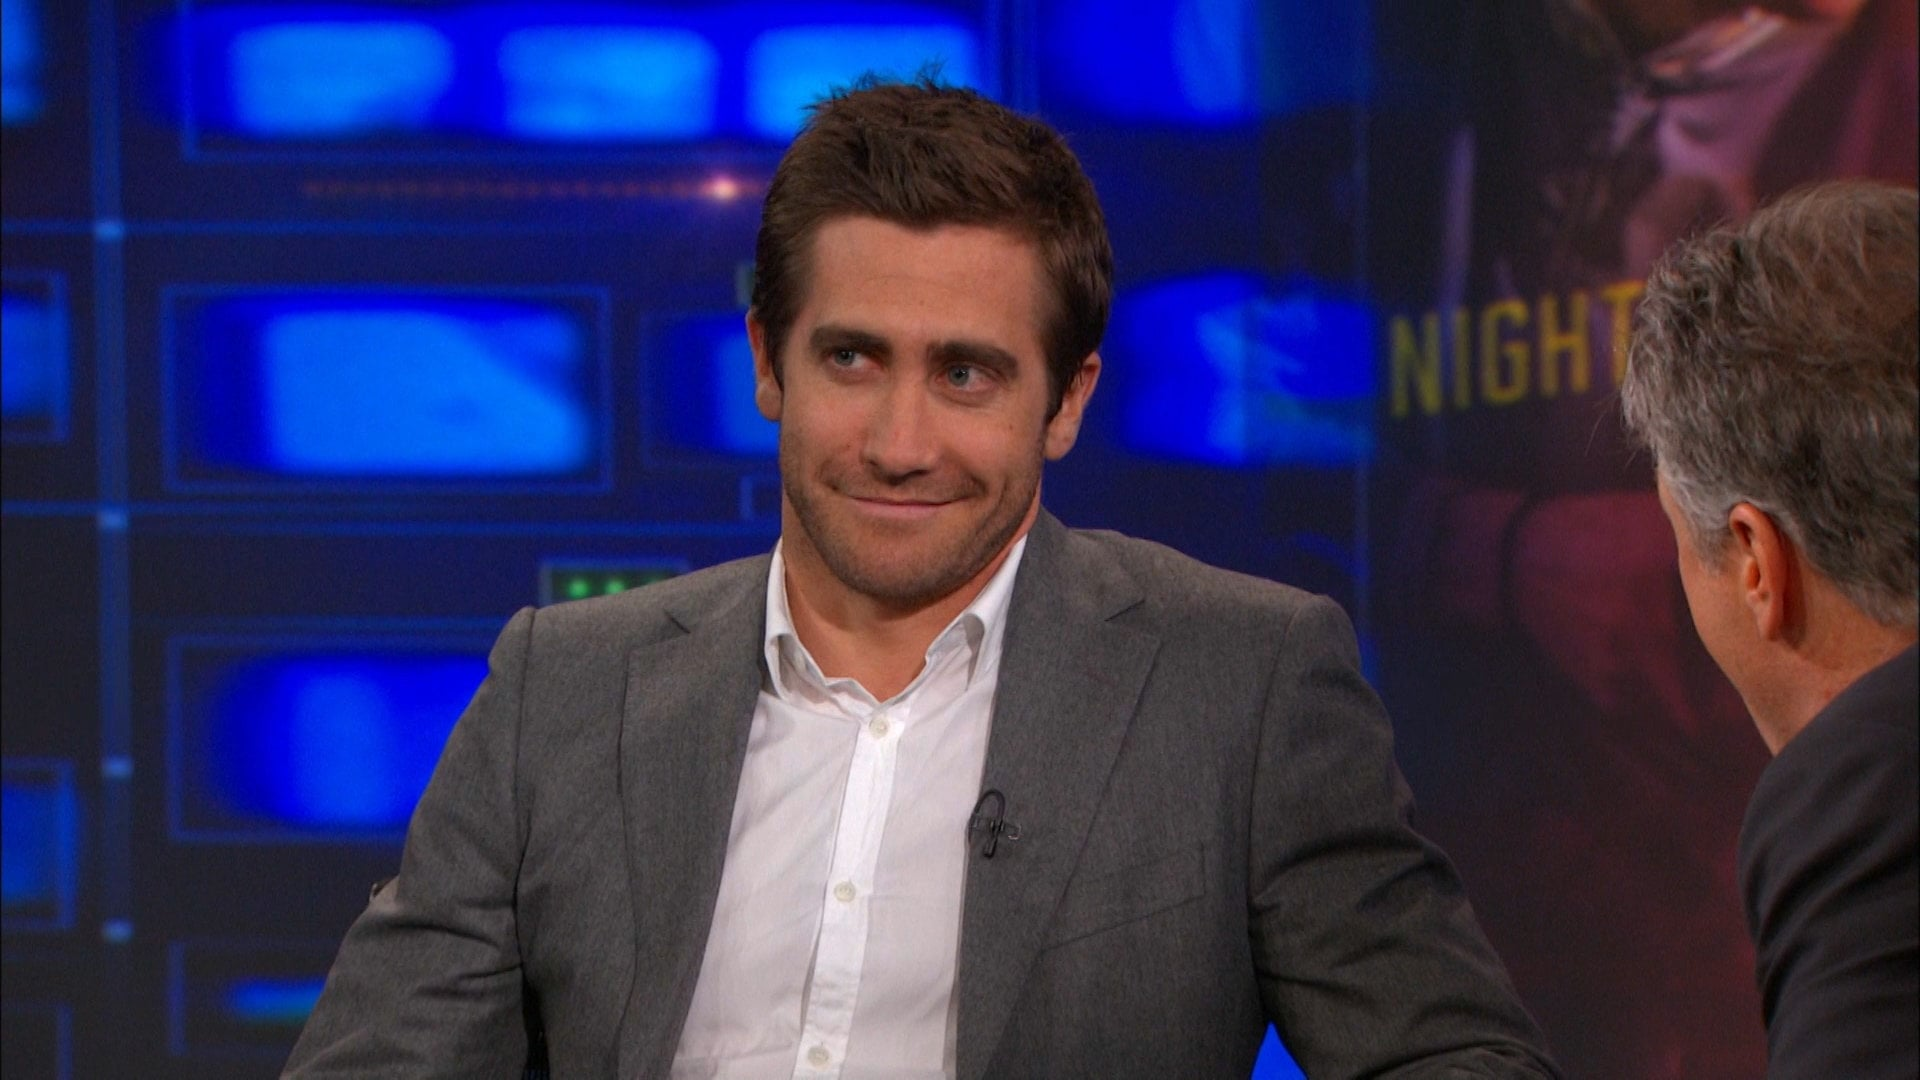 The Daily Show with Trevor Noah Season 20 :Episode 17  Jake Gyllenhaal